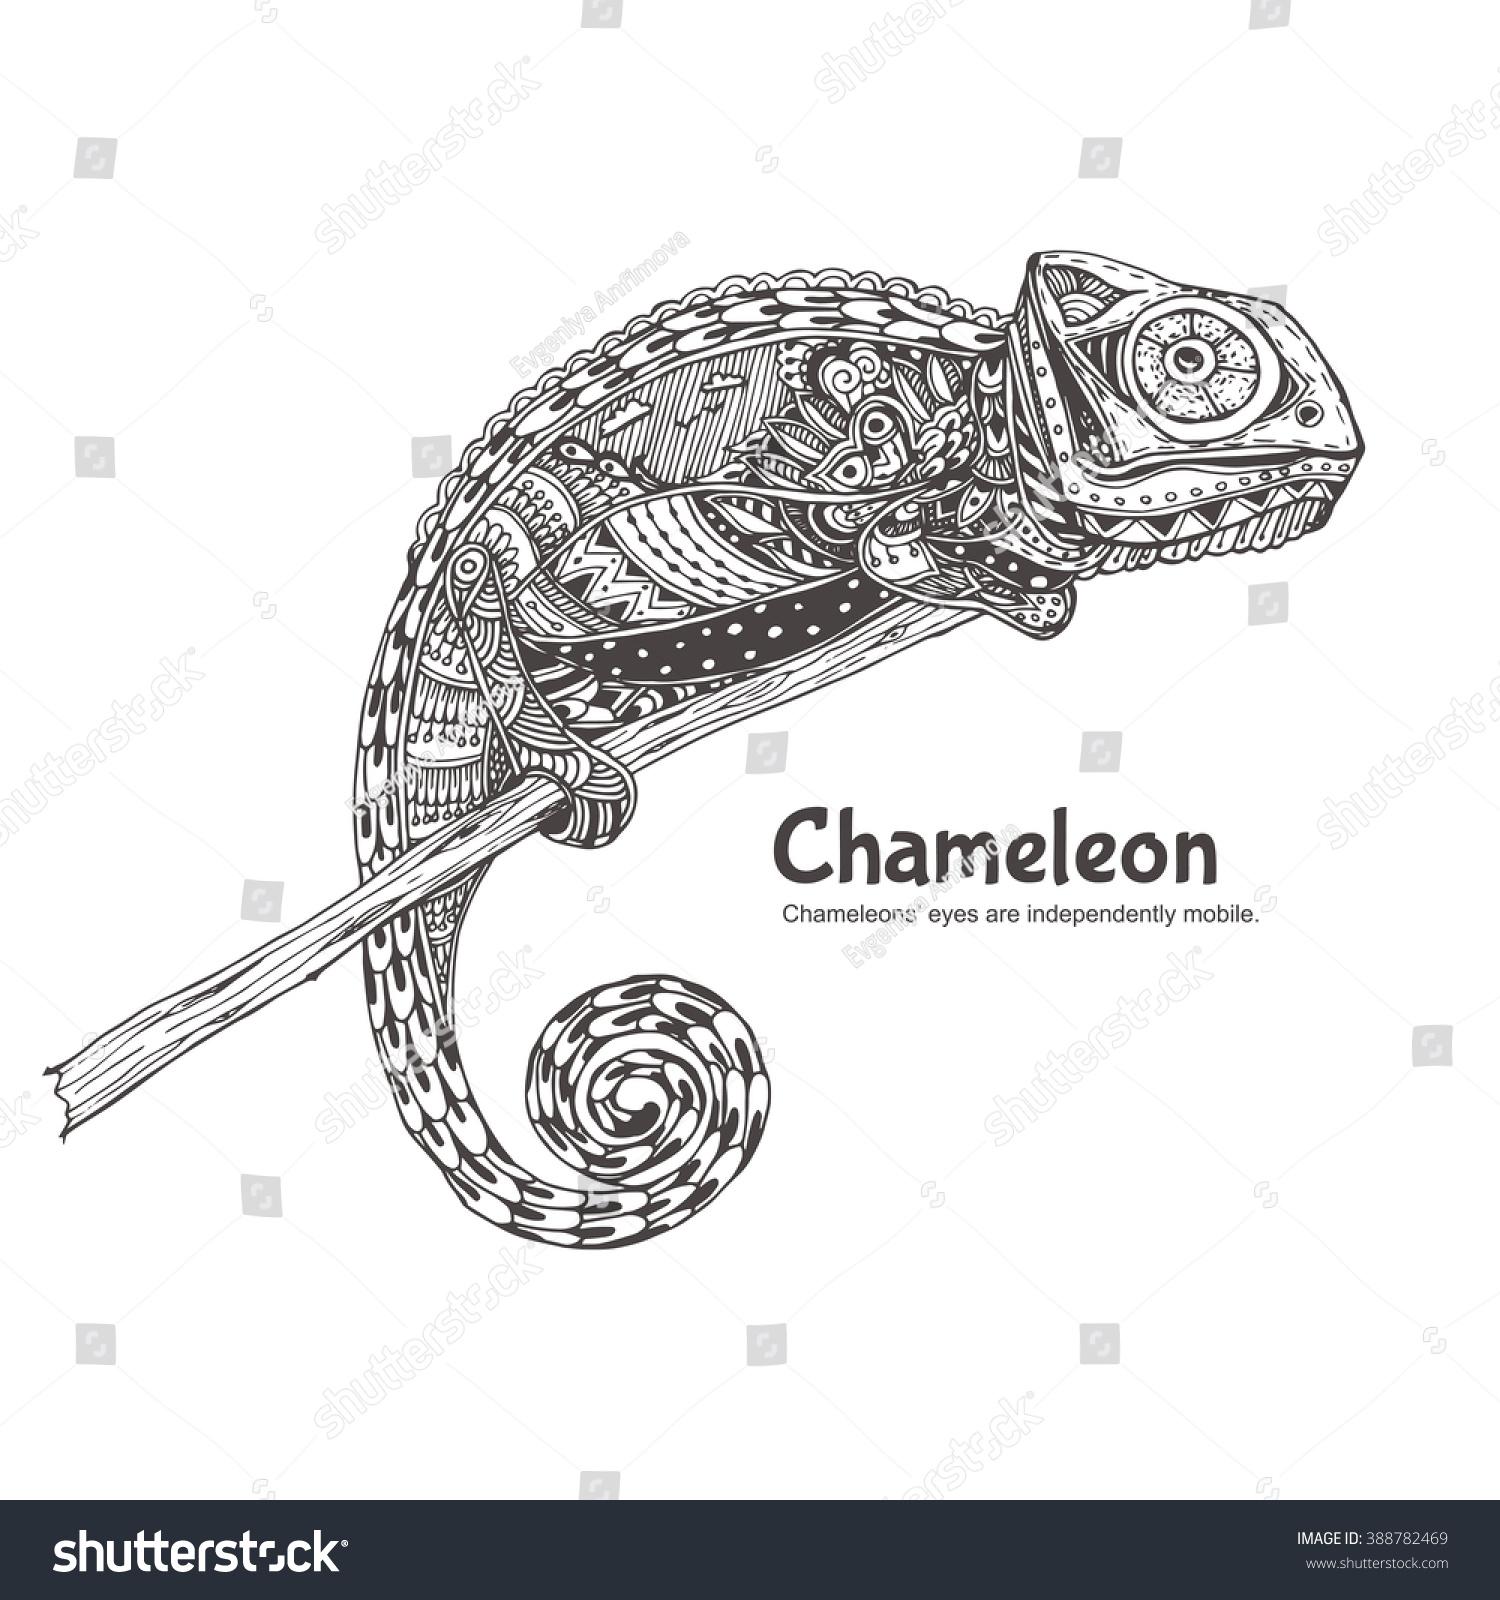 chameleon doodle pattern coloring page zendala stock vector